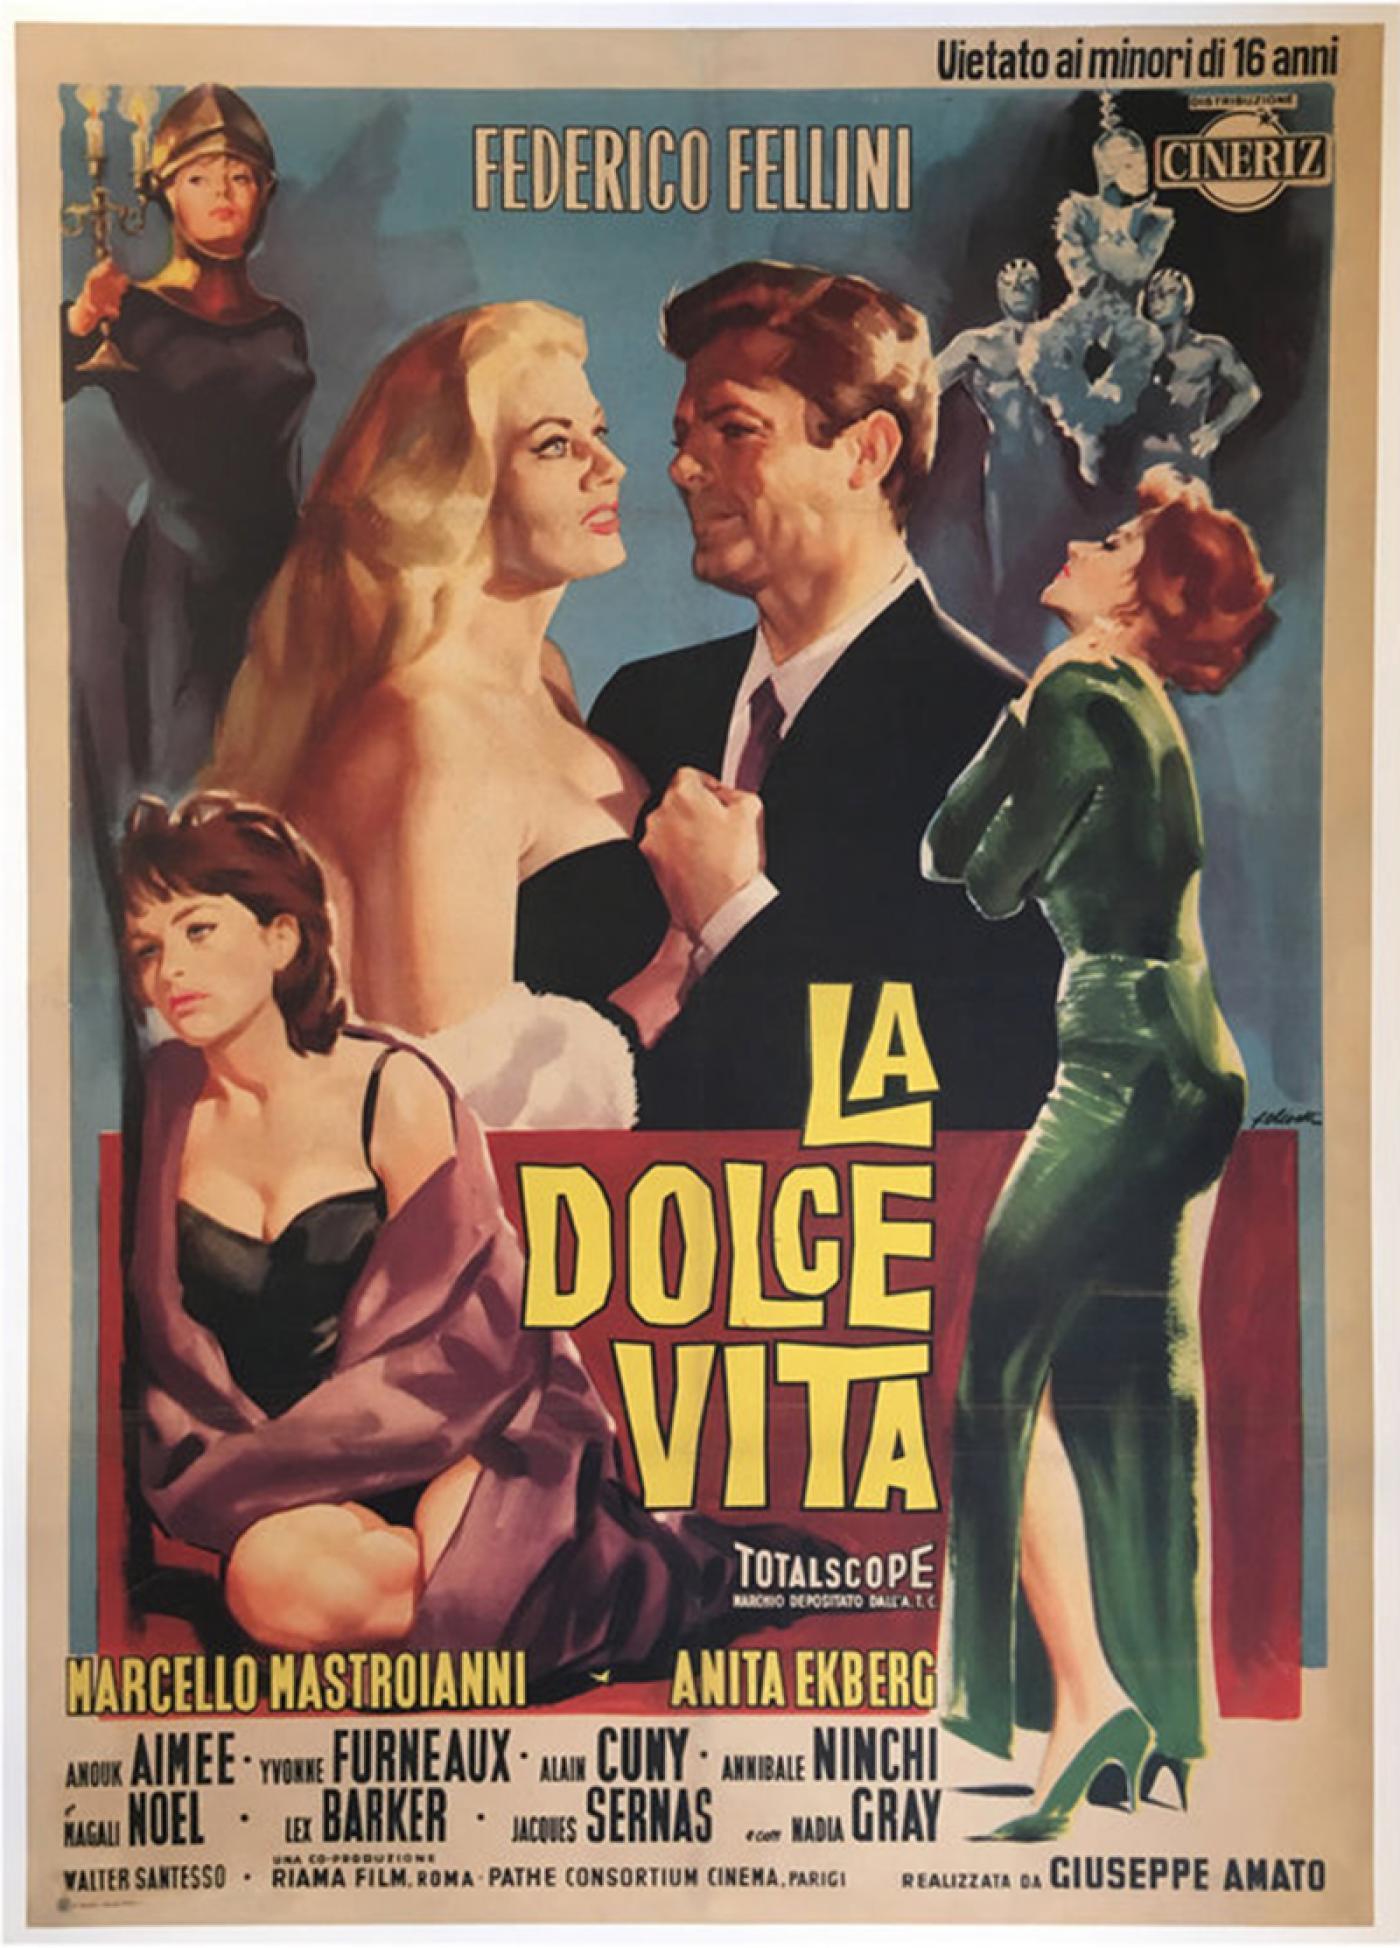 Federico Fellini Original Quot La Dolce Vita Quot Film Poster 1960